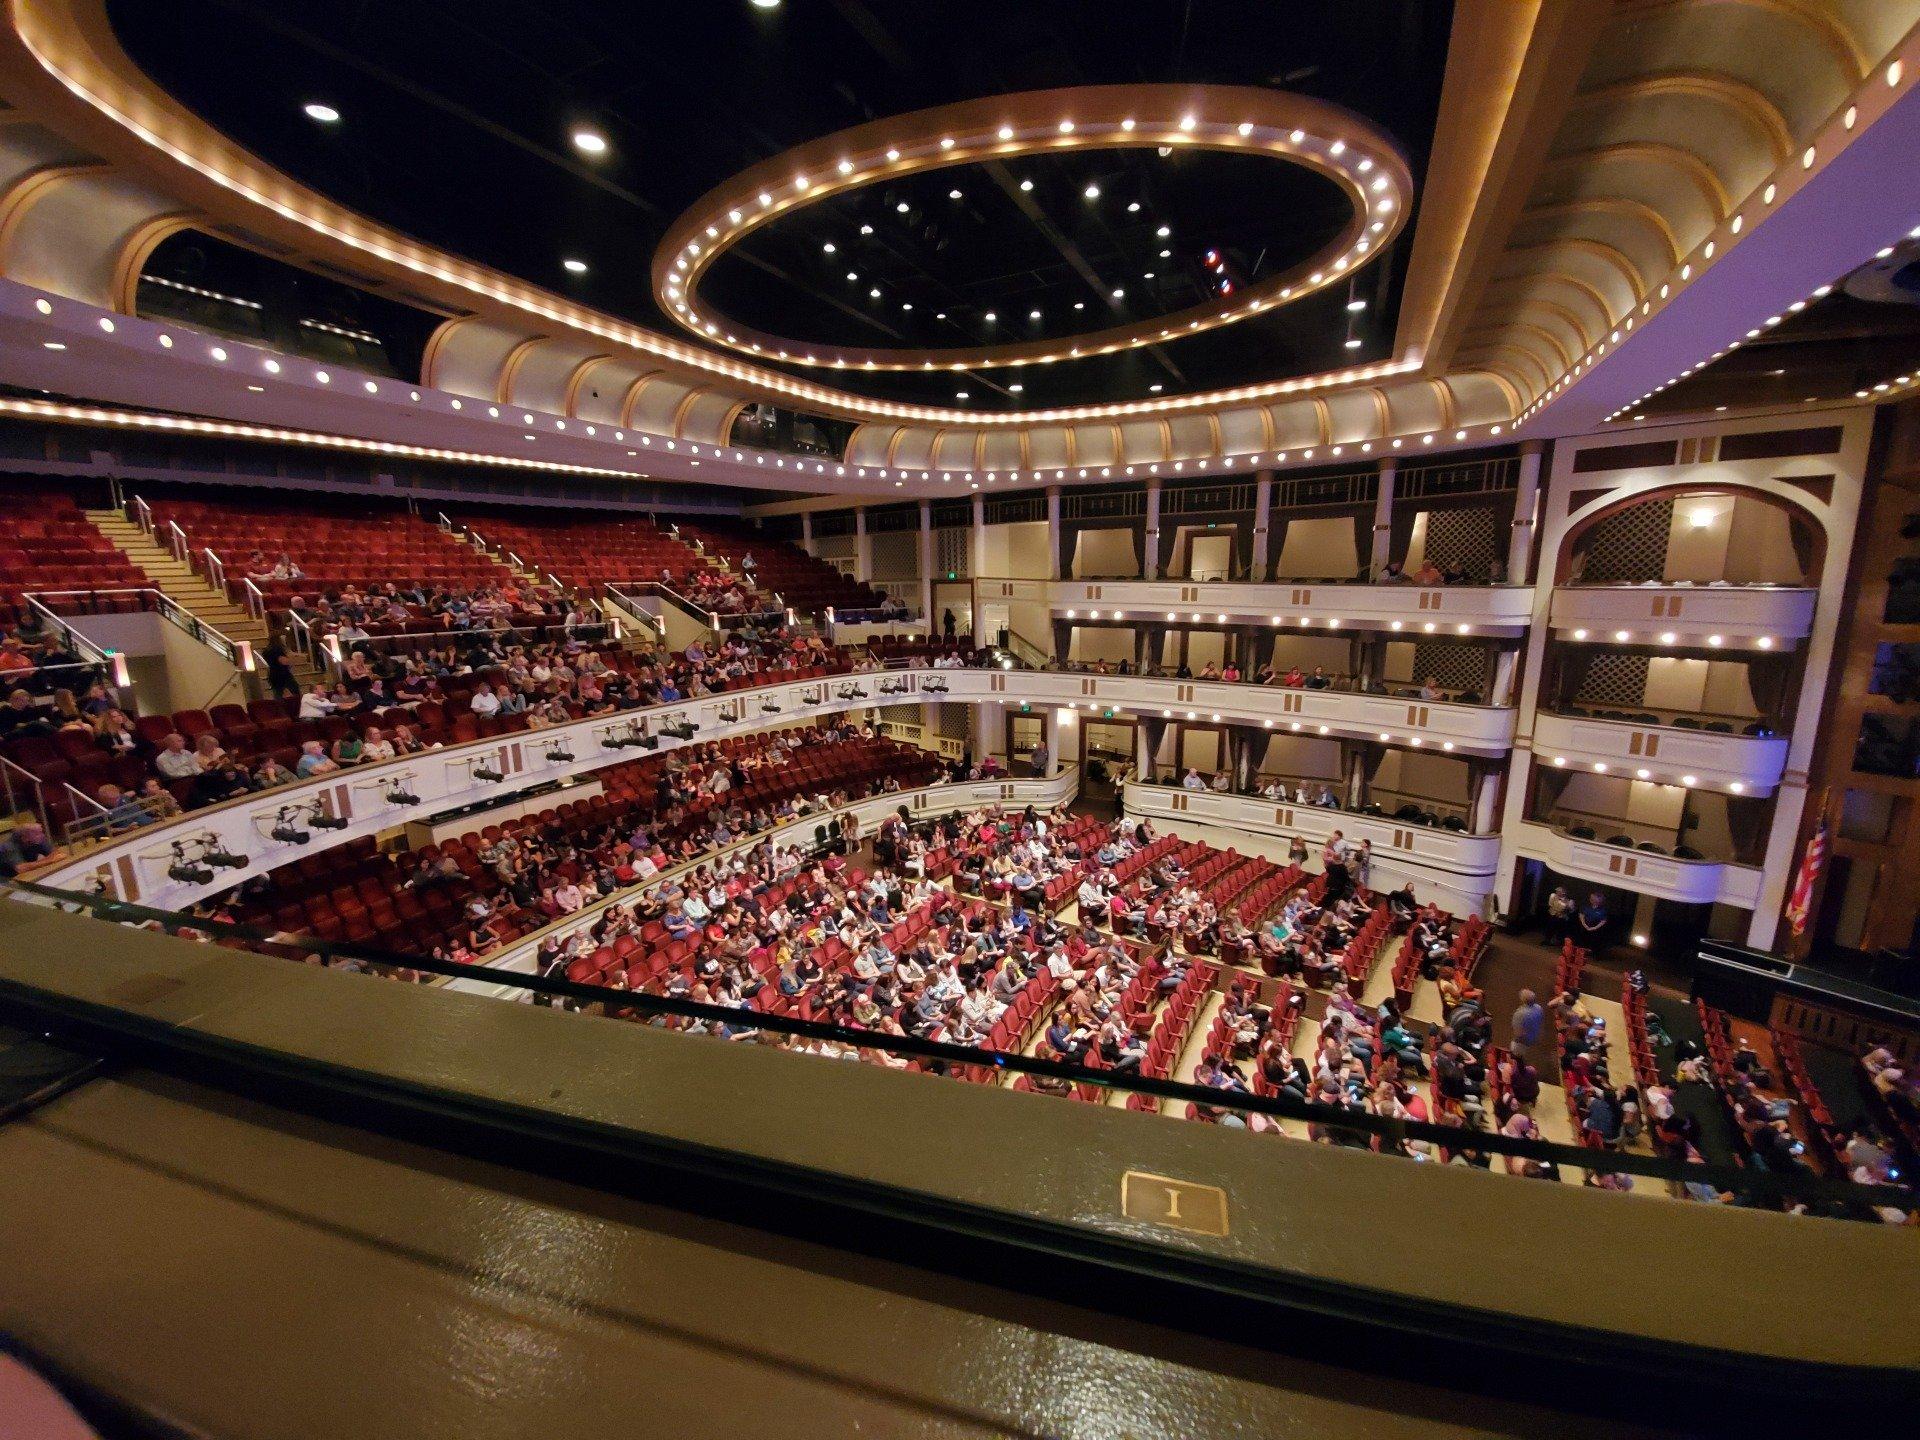 Mahaffey Theatre Section Box Row 34 Seat 1